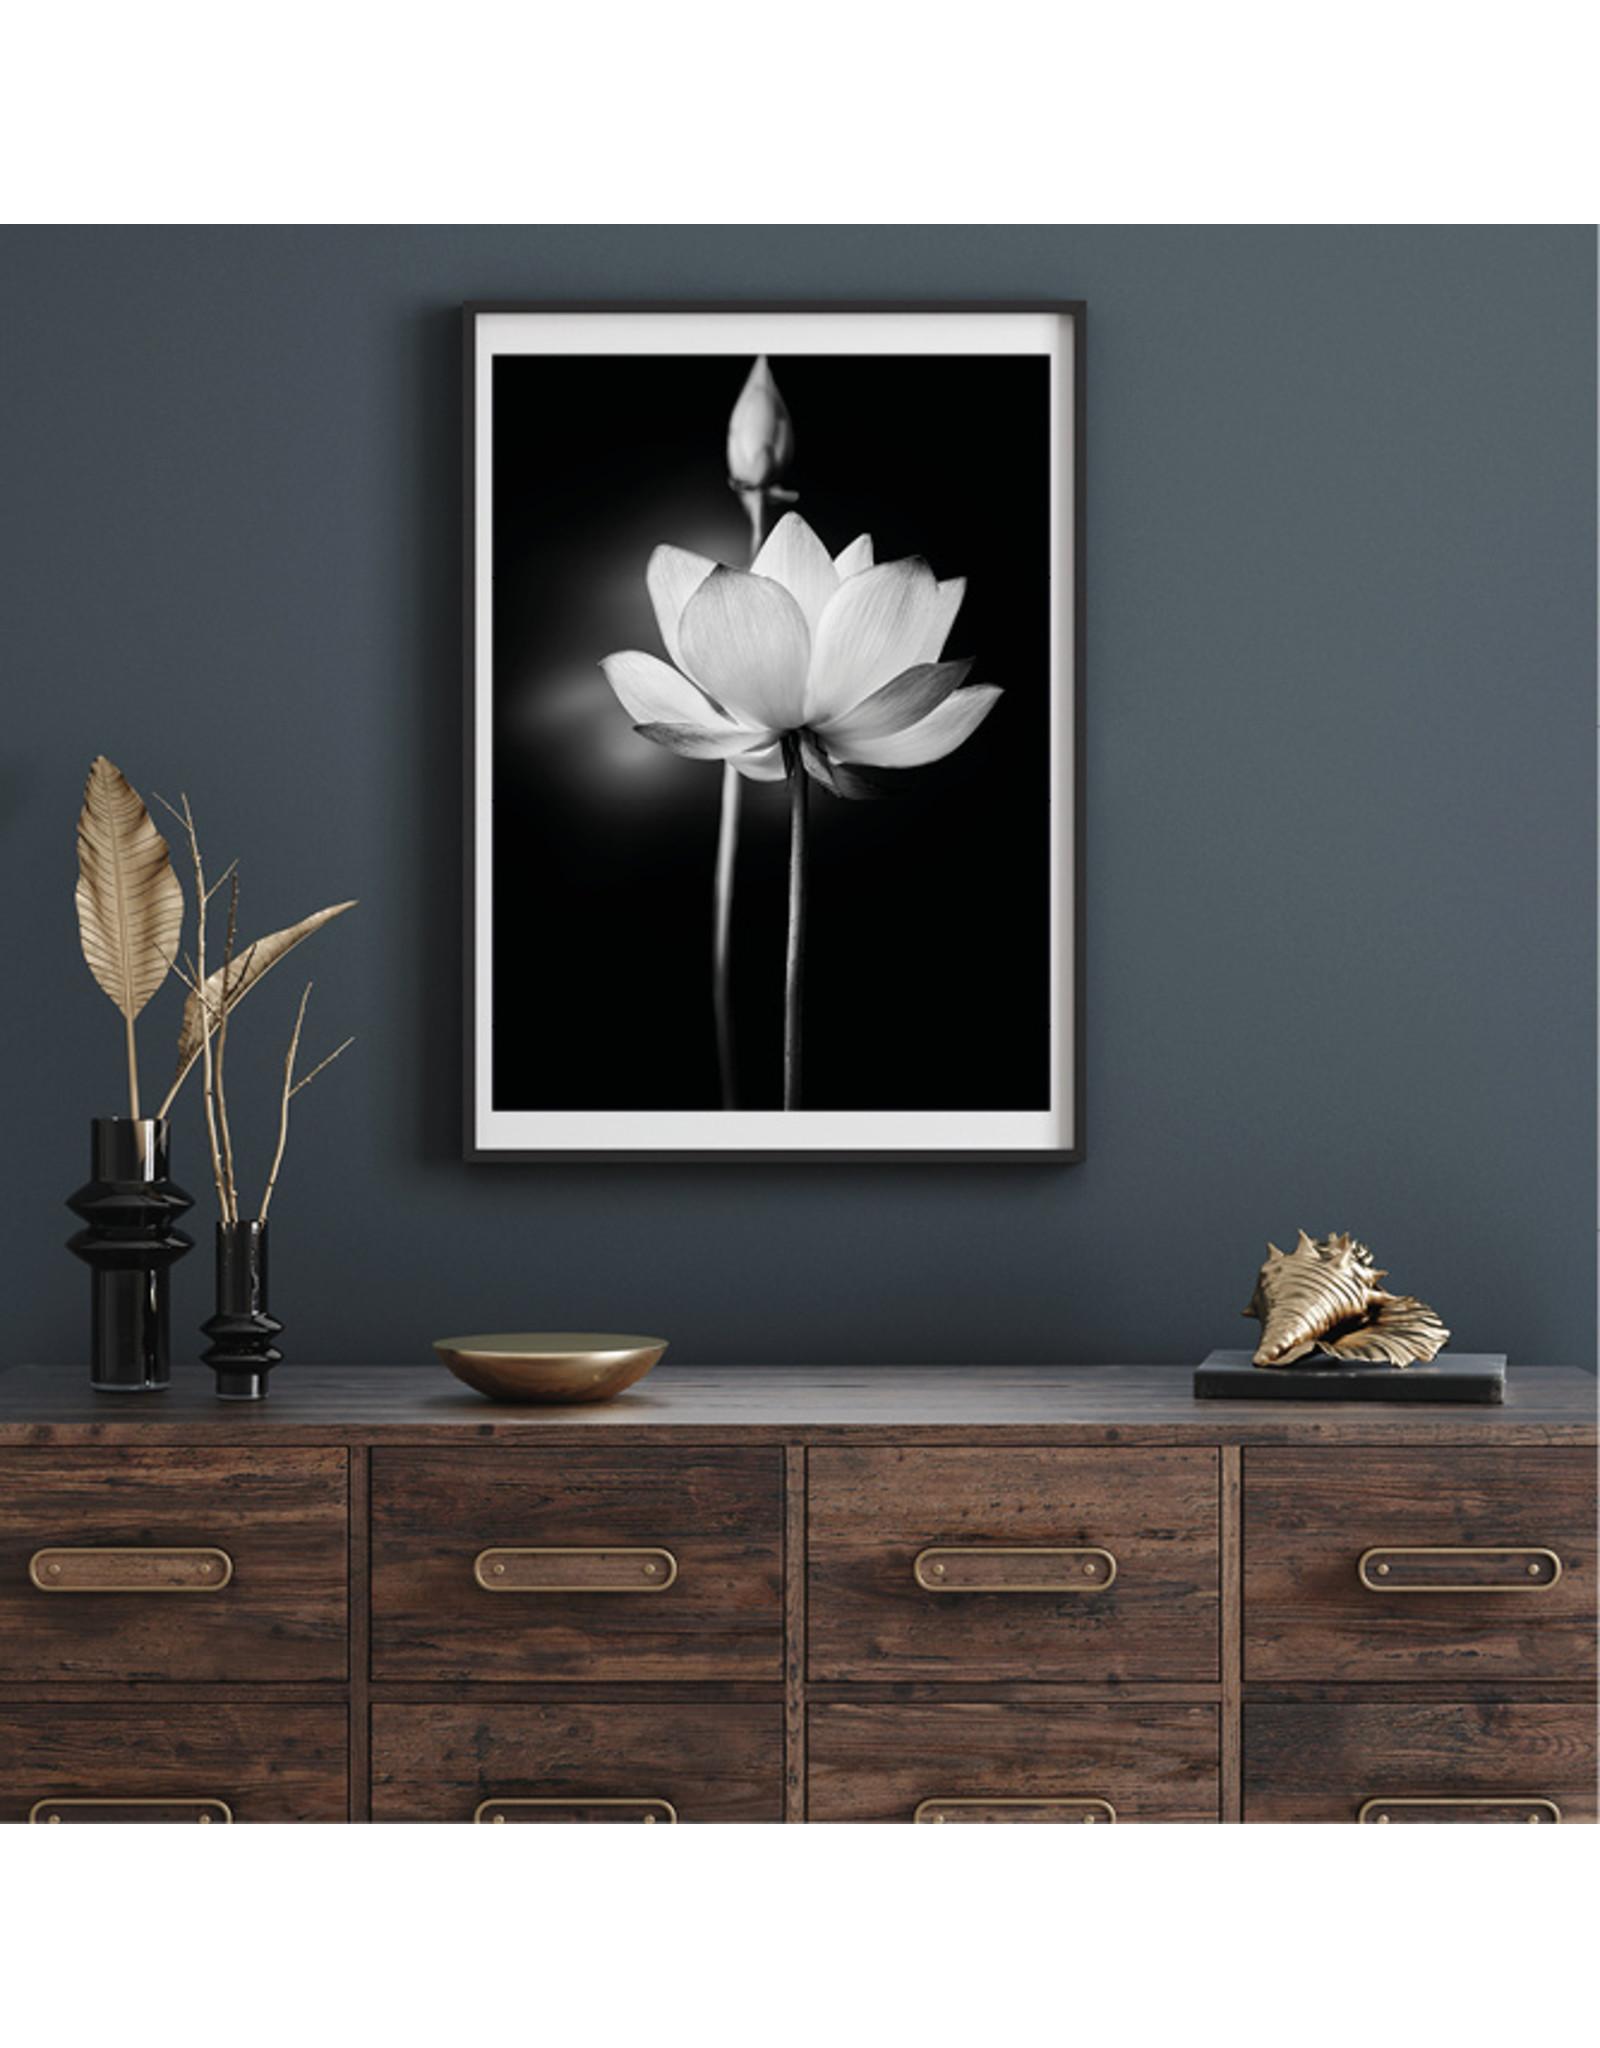 Dunnebier Home Poster Witte Lotus op zwarte achtergrond